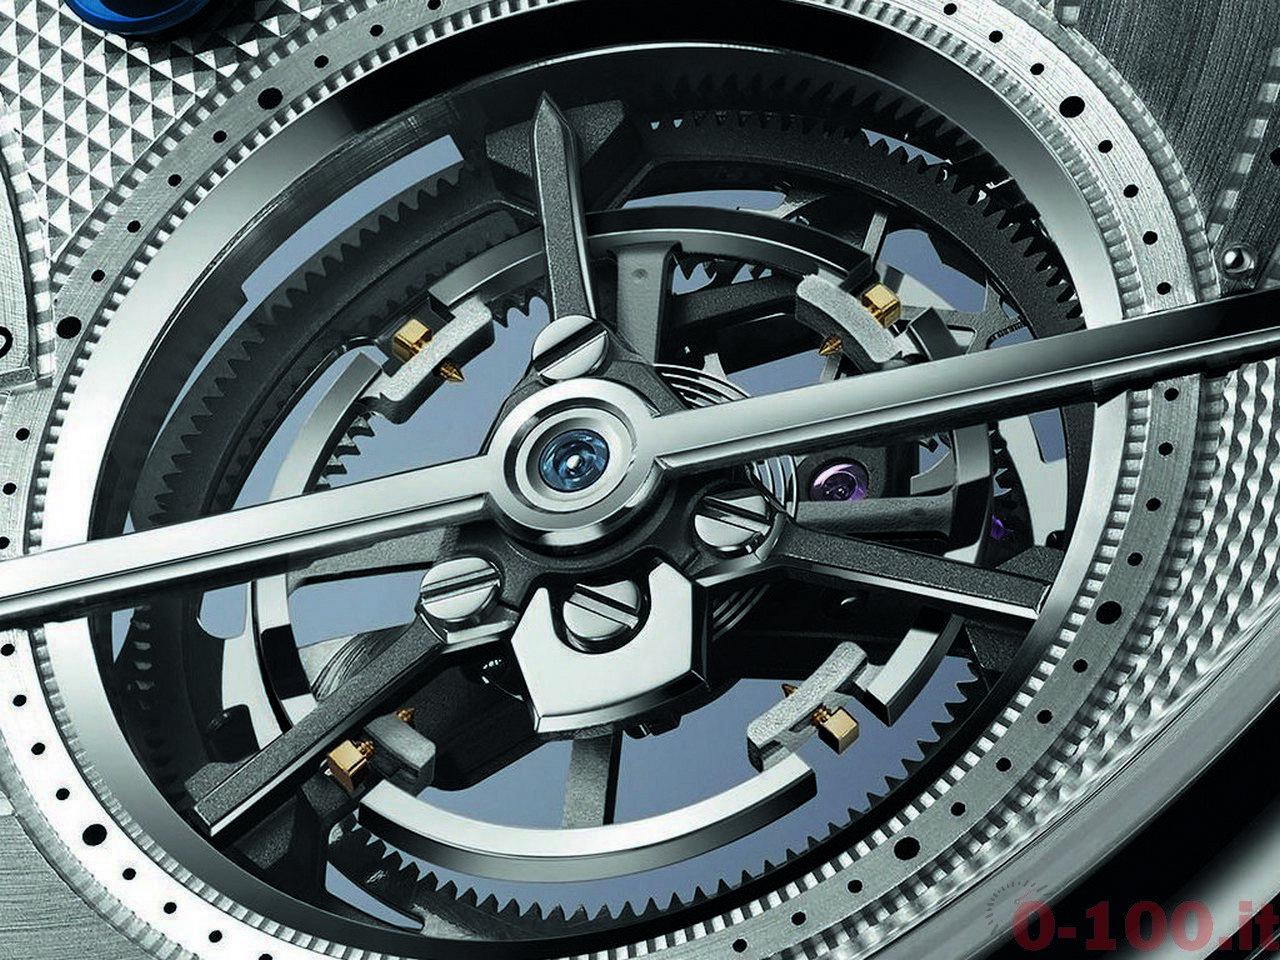 breguet-classique-grande-complication-tourbillon-extra-plat-ref-5377-baselworld-2014_0-100_10